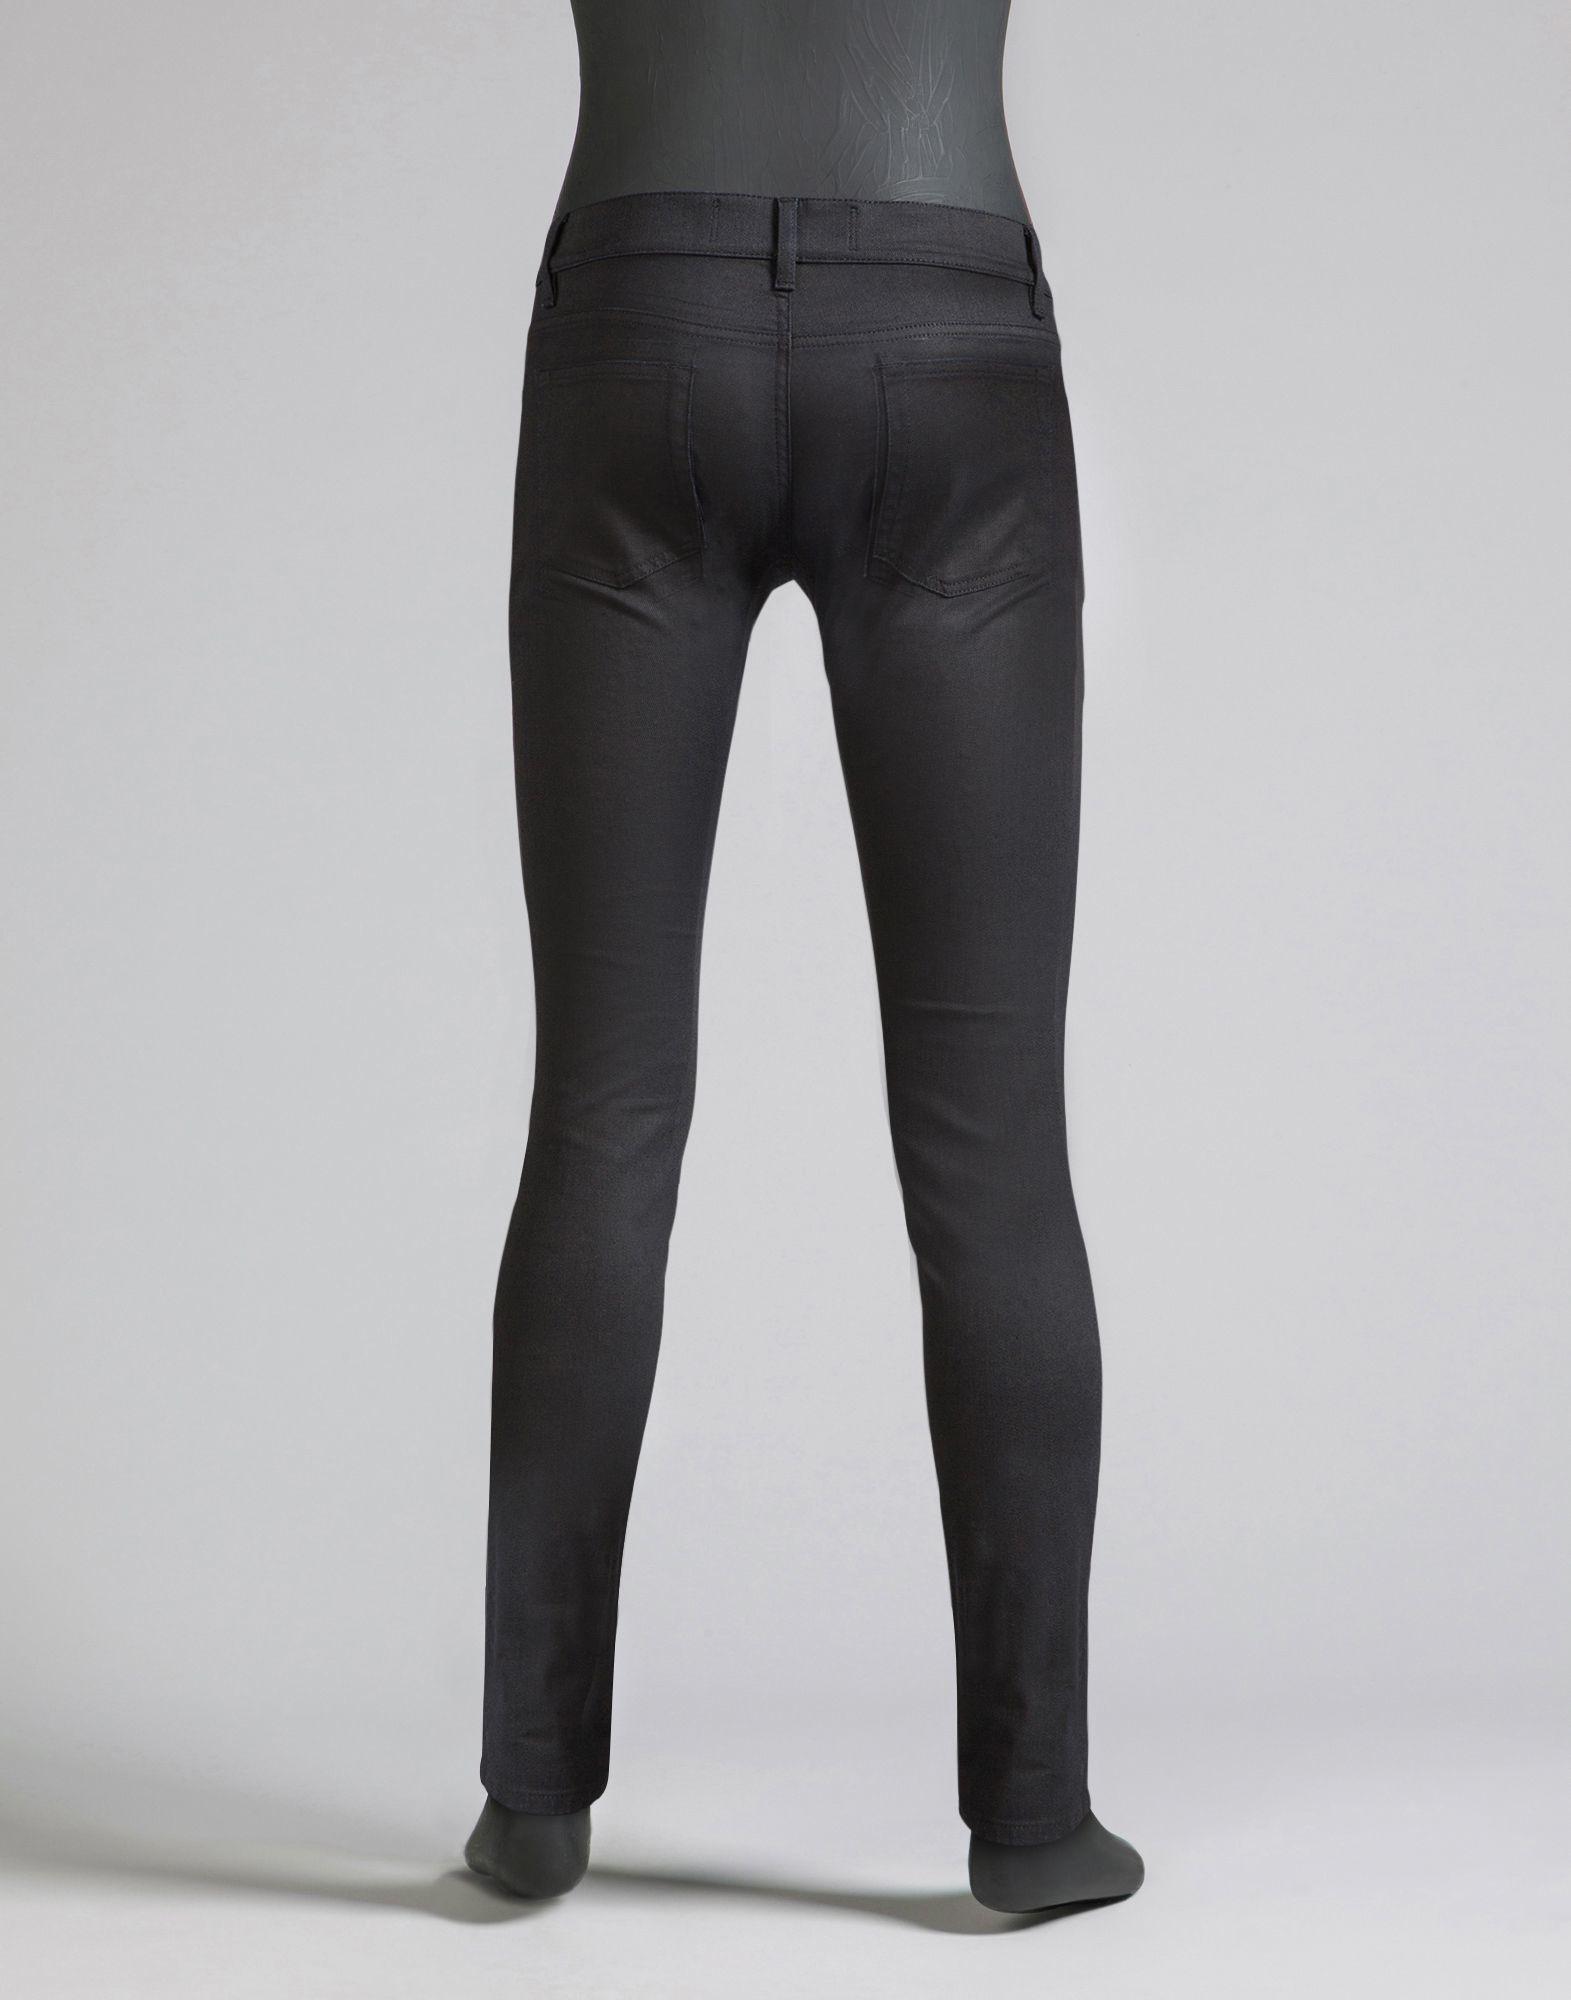 Dolce & Gabbana Super Slim Fit Stretch Denim Jeans in Black for Men